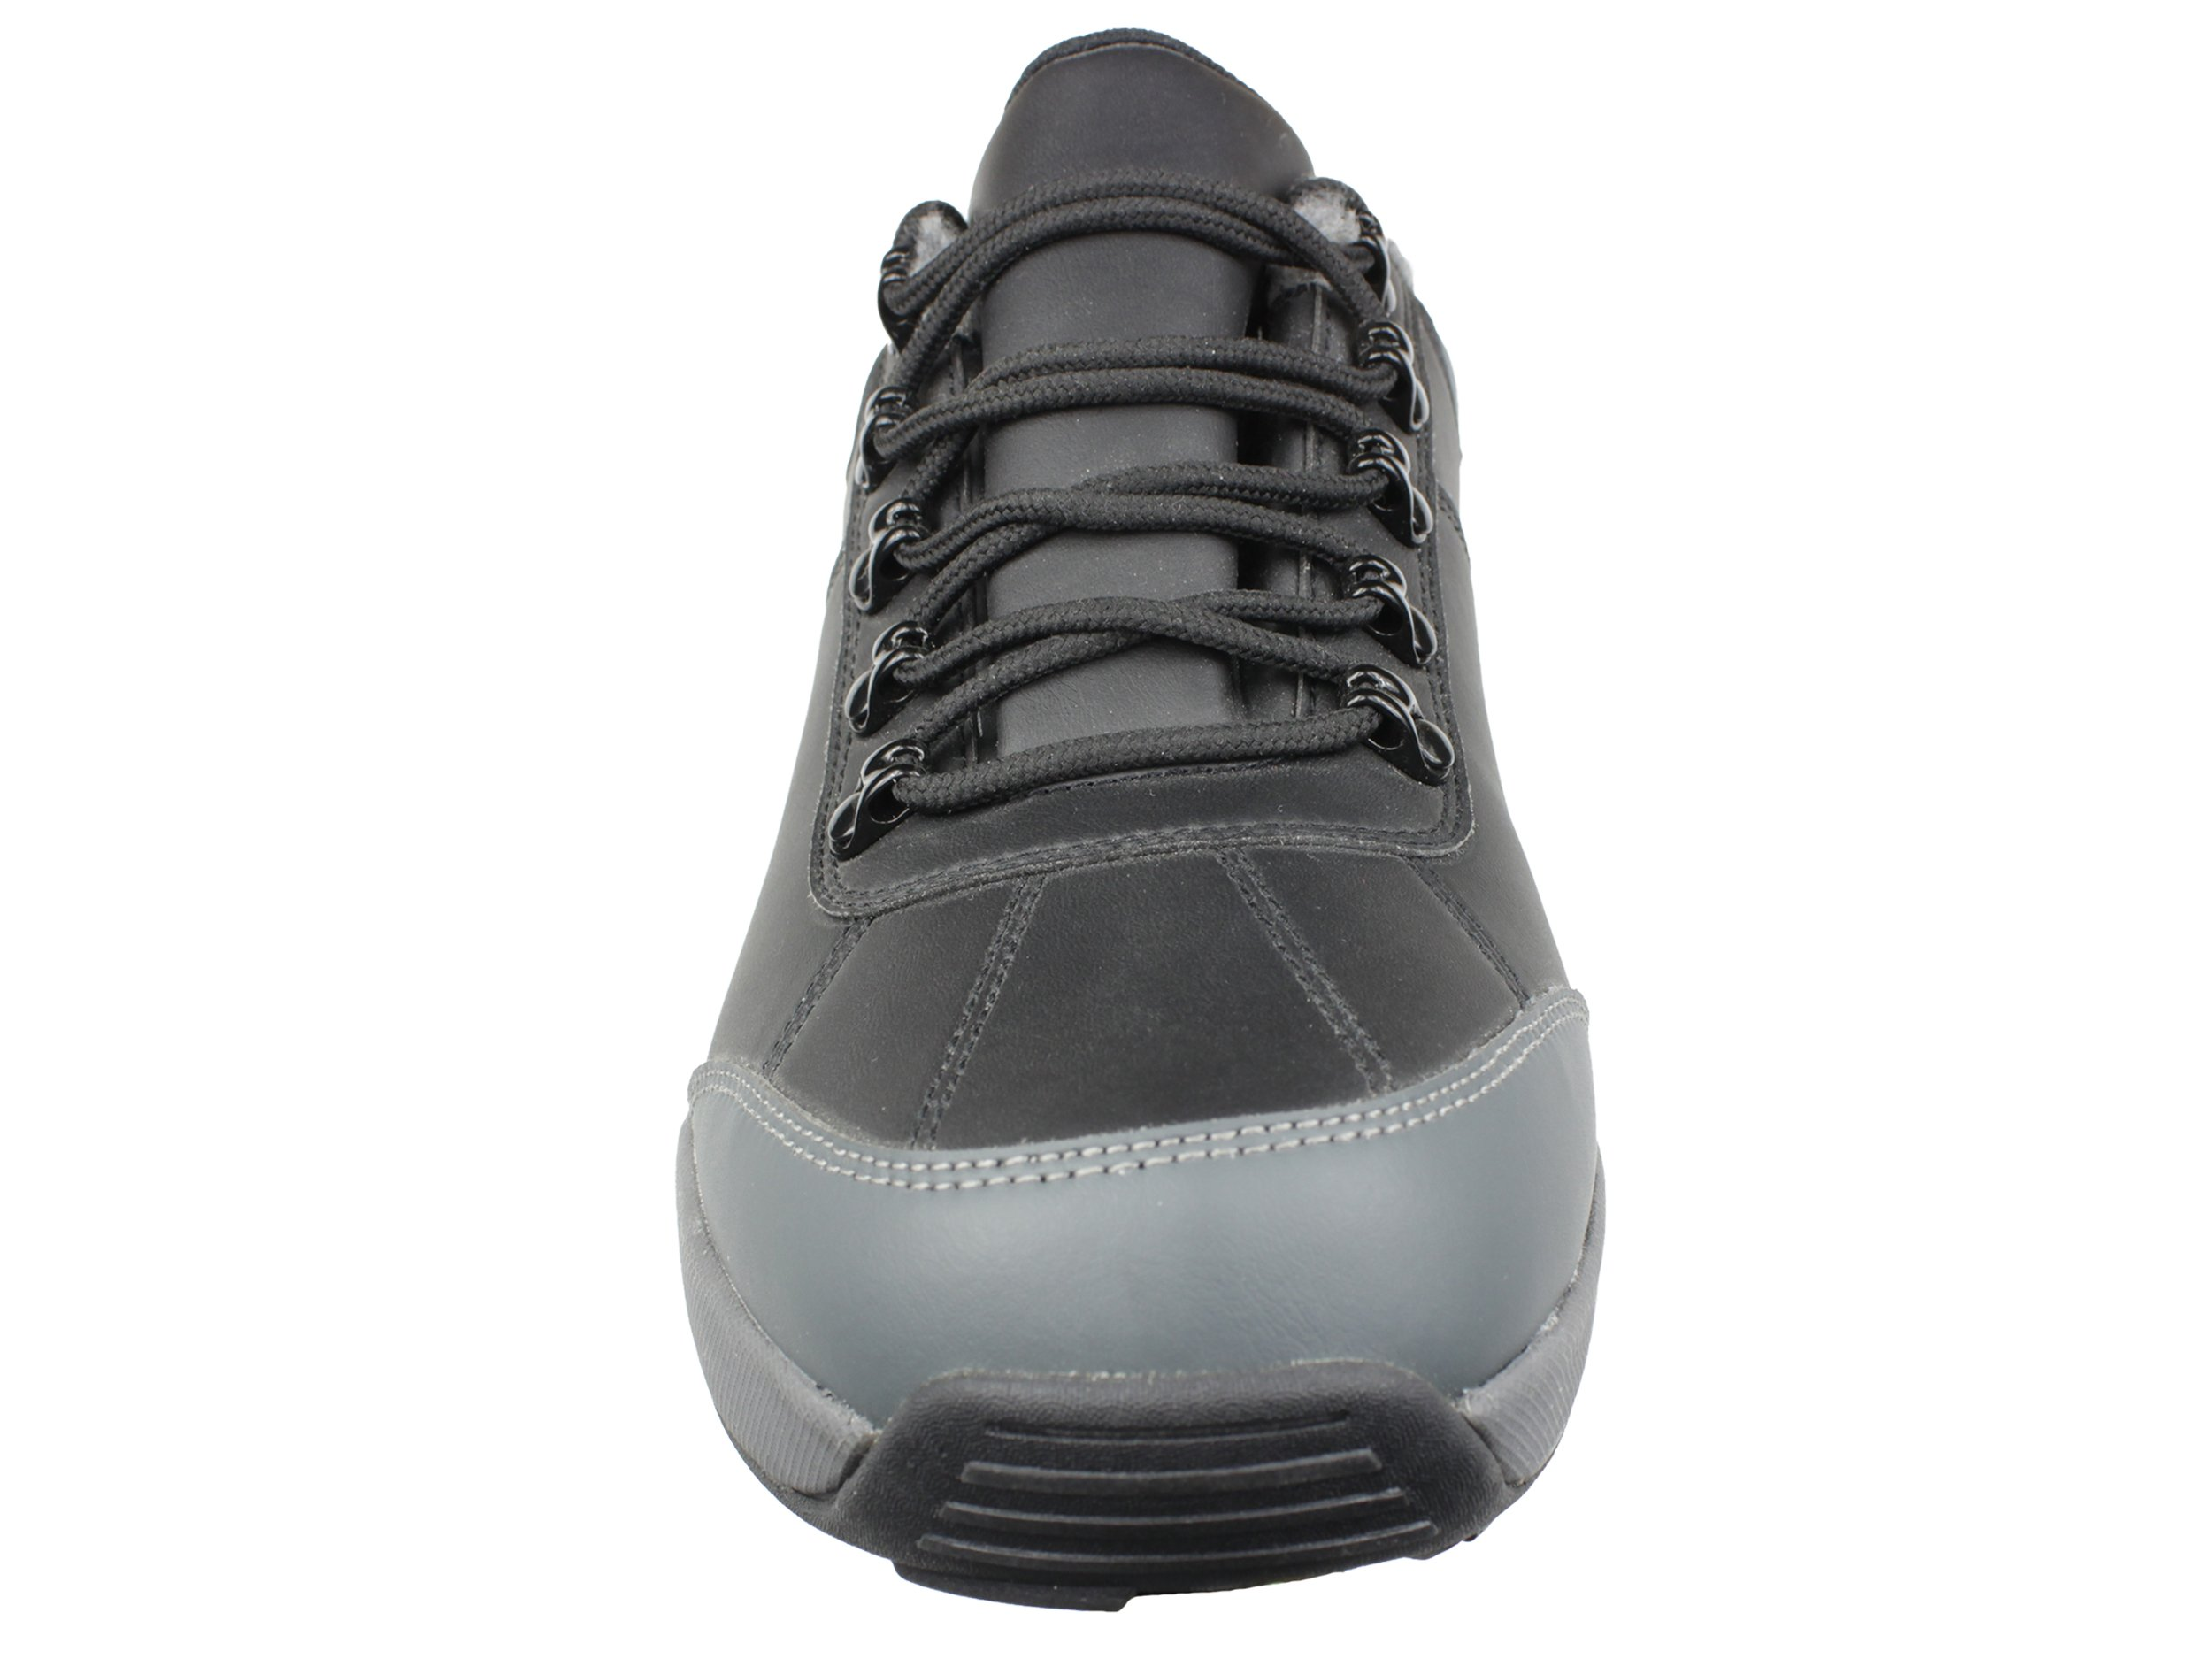 Oregon Mudders Womens CW400N Waterproof Oxford Golf Shoe with Turf Nipple Sole 9M US Womens by Oregon Mudders (Image #3)